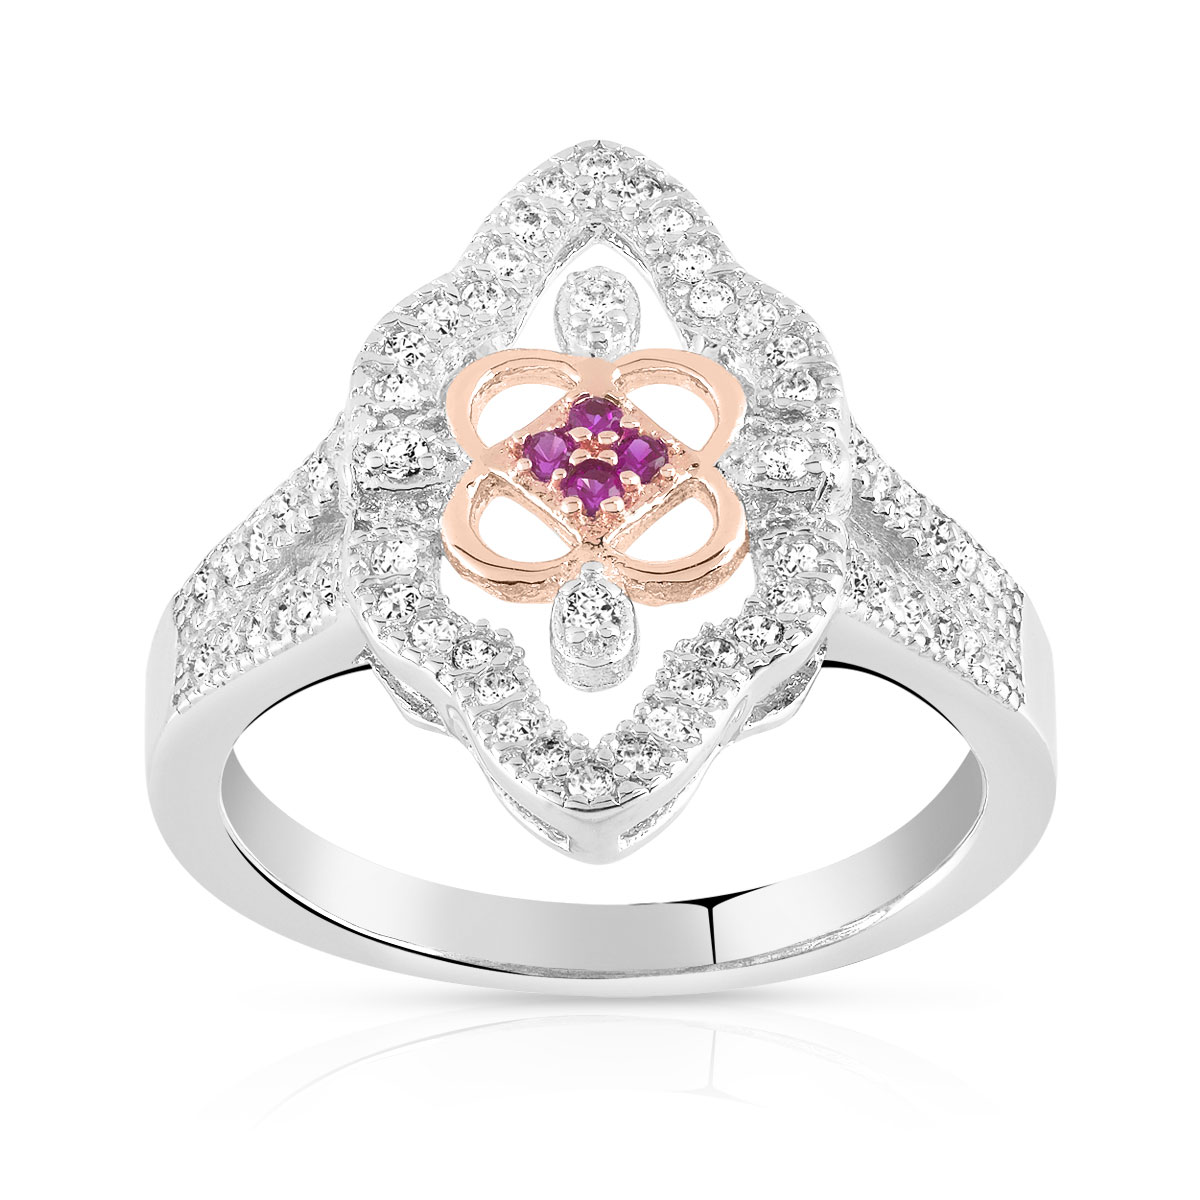 Célèbre Bijoux Pierre-Rubis - Bijoux rubis au meilleur prix| MATY RS03